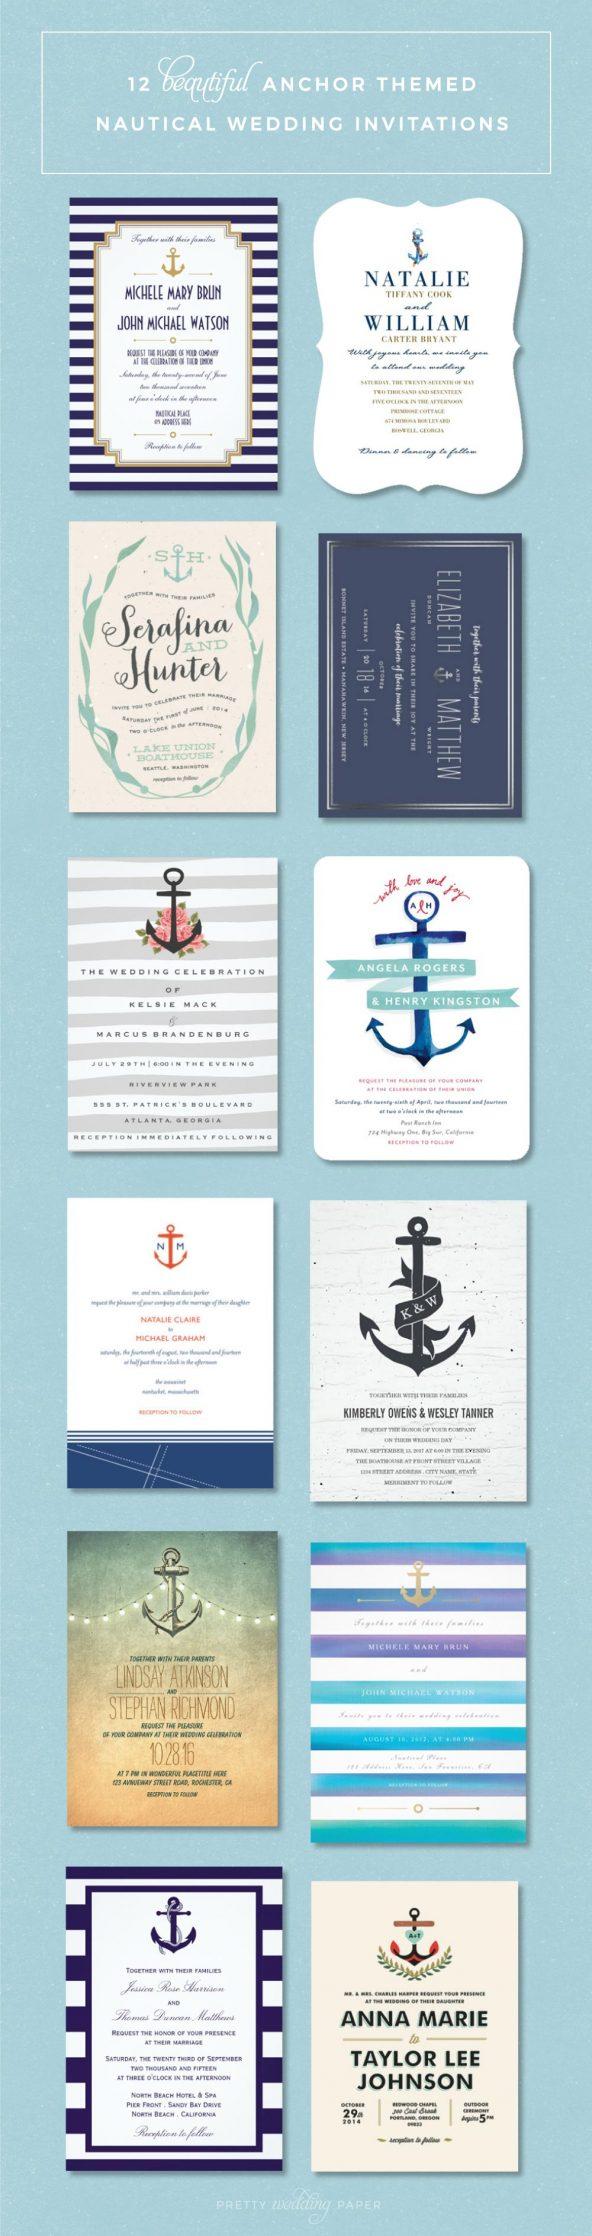 Nautical Wedding Invitations // Anchor-Themed Wedding Invitations // Nautical Wedding Ideas